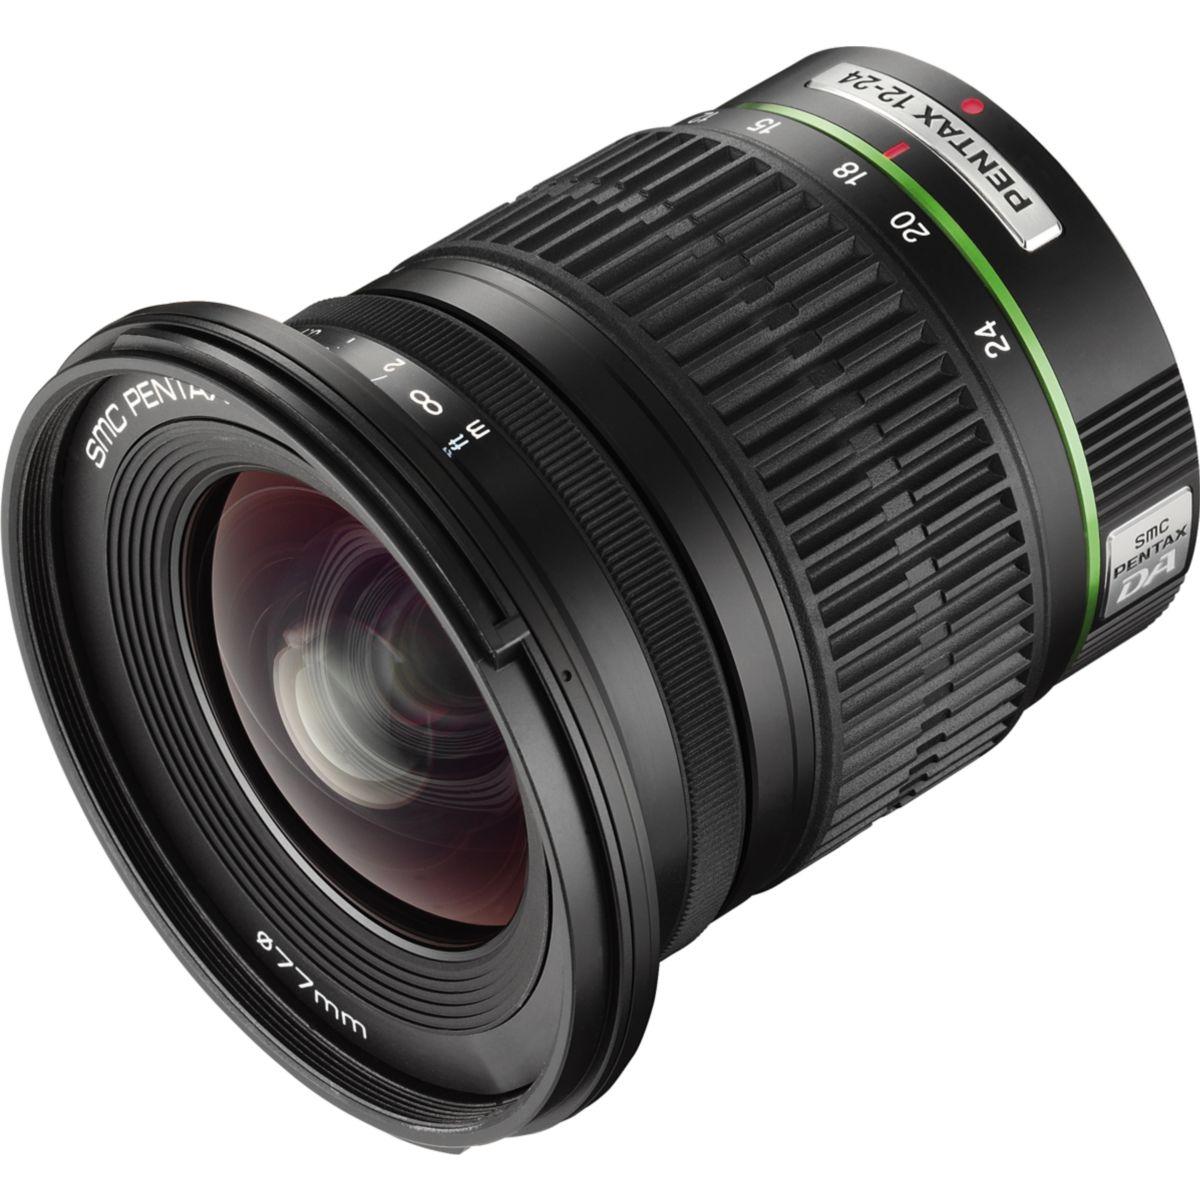 Objectif PENTAX 12-24mm f/4 ED AL (IF)